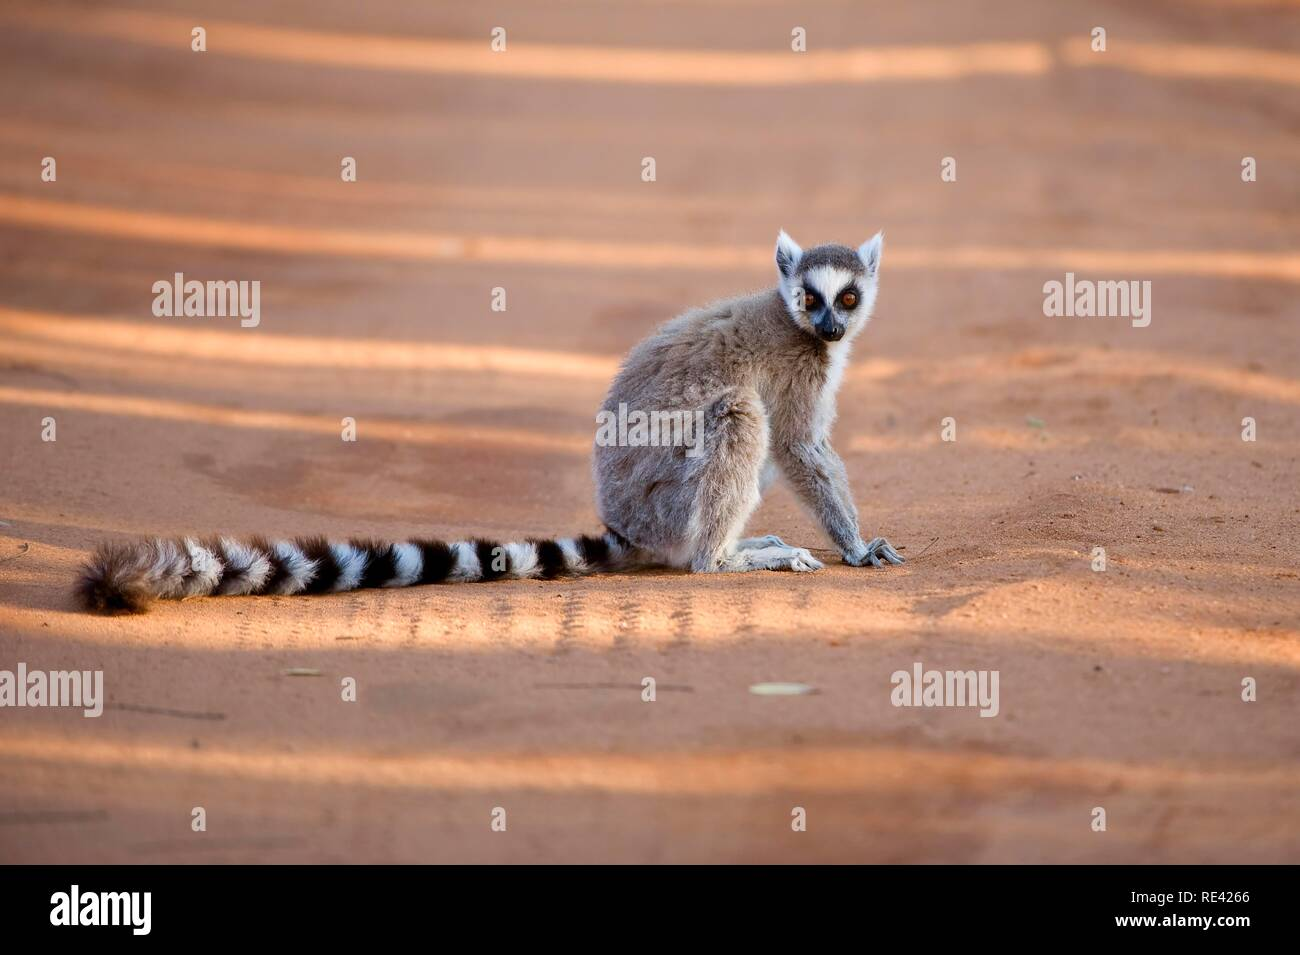 Ring-tailed Lemur (Lemur catta), Near Threatened, Berenty Nature Reserve, Madagascar, Africa - Stock Image